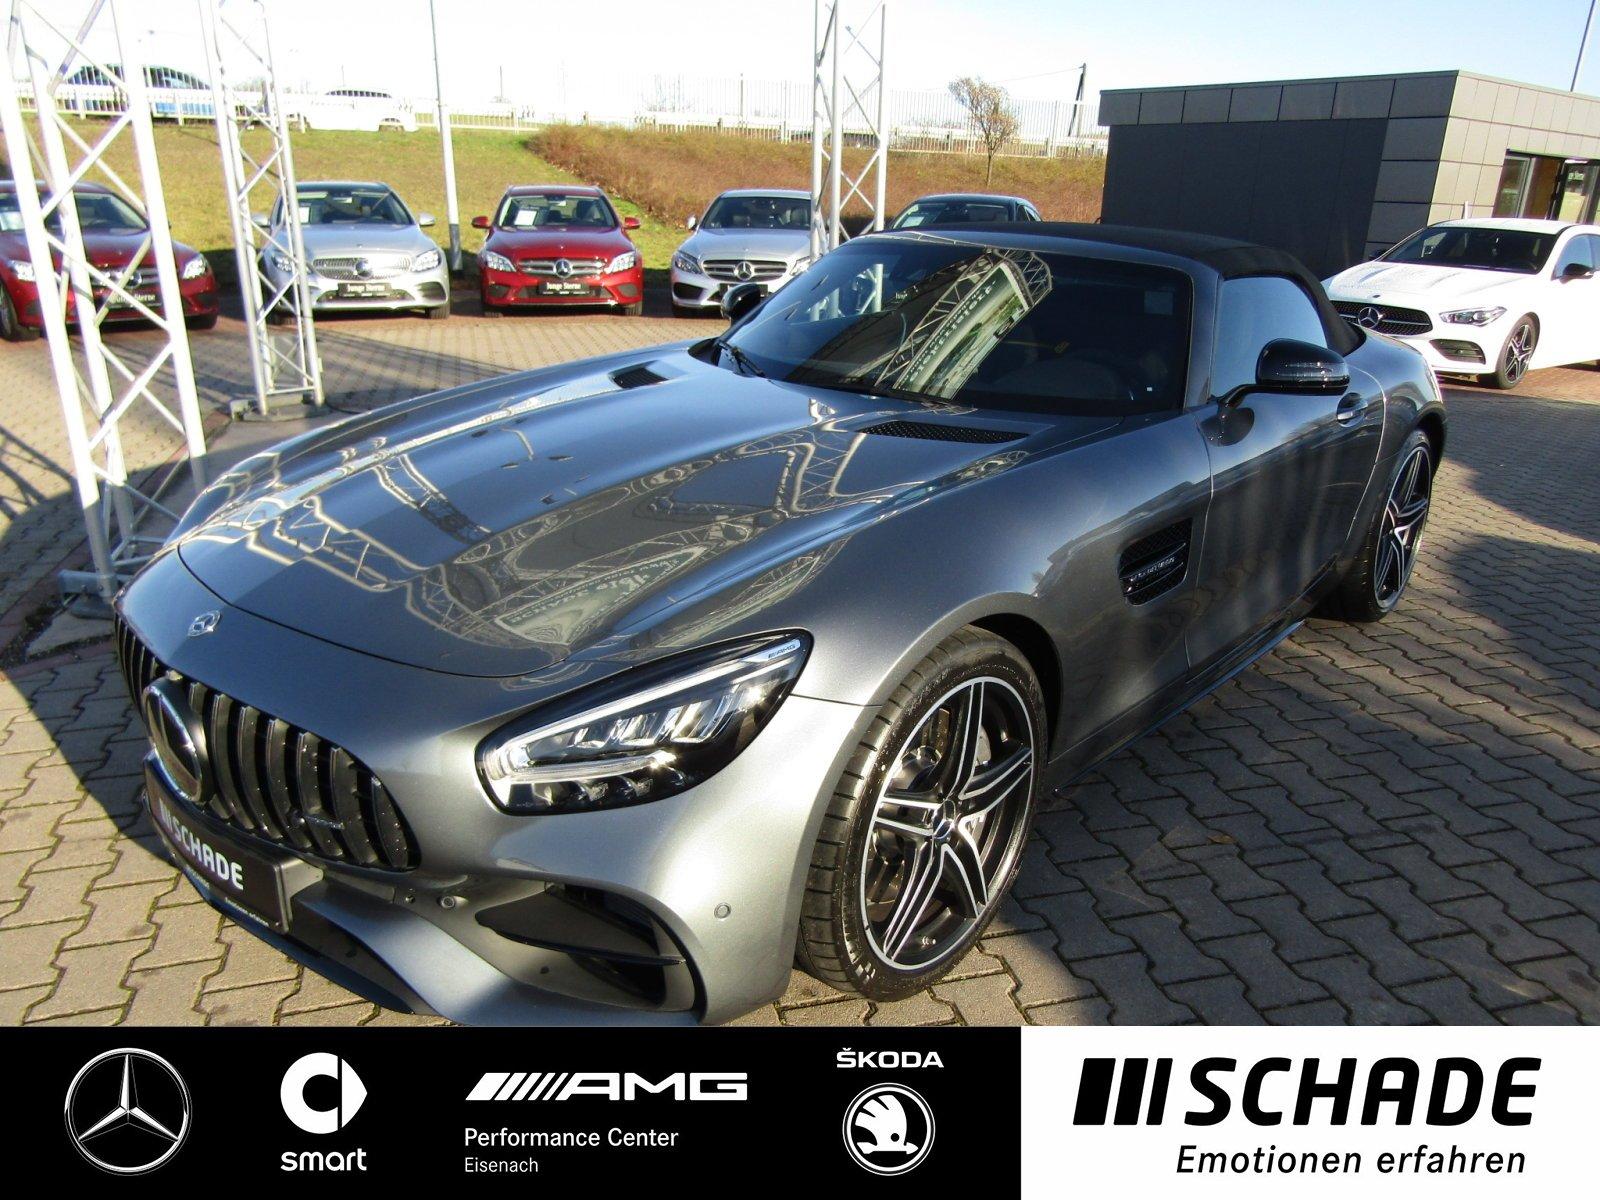 Mercedes-Benz AMG GT Roadster *Comand*Perform-AbGas* AMG Sport, Jahr 2019, Benzin